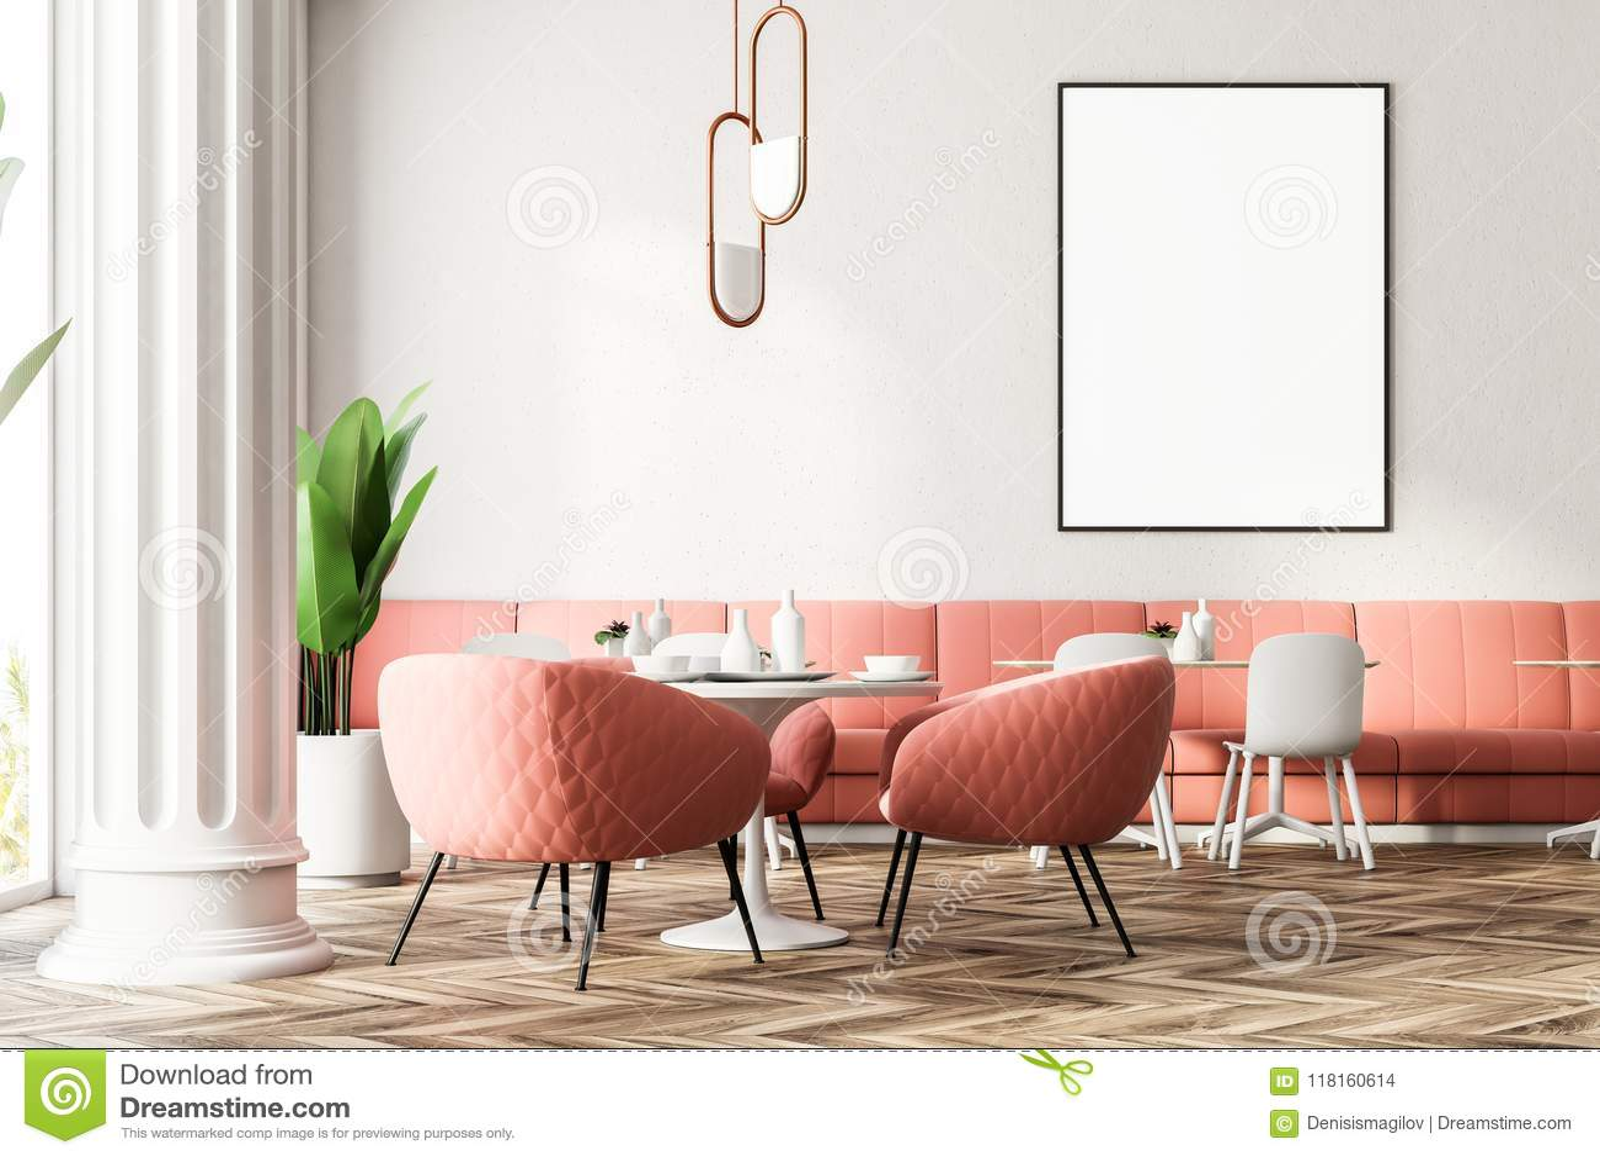 Pink Sofas Modern Restaurant Interior Poster Stock Illustration Illustration Of Lifestyle Banner 118160614